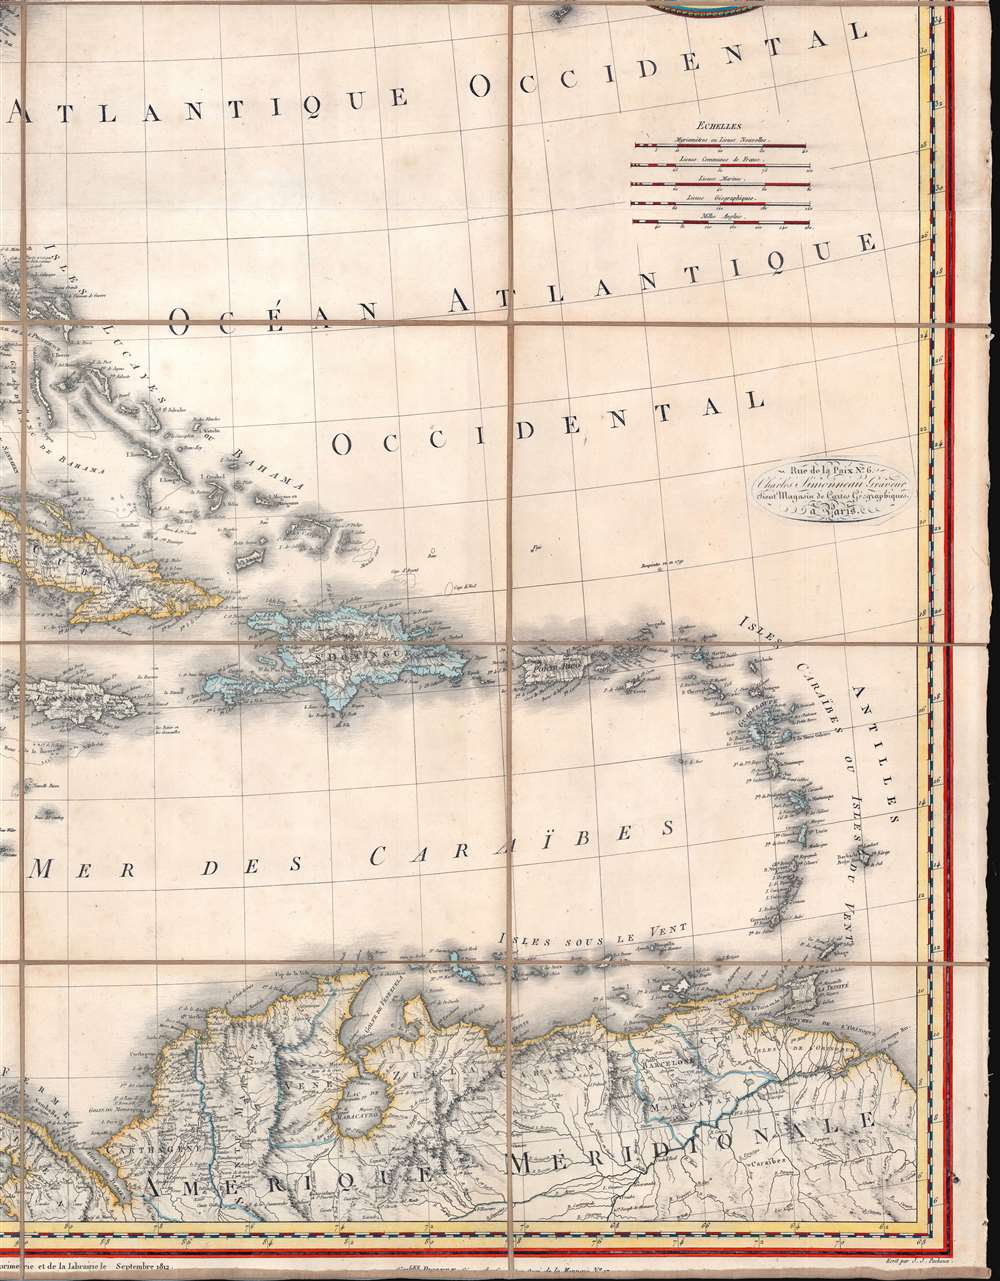 A Map of the United States and Canada, New-Scotland, New-Brunswick and New-Foundland. / Carte des Etats-Unis, avec le Canada, La Nouvelle Ecosse, Le Nouveau Brunswick et Terre-Neuve. / A Map of the West-Indies and of the Mexican-Gulph. / Carte des Indies Occidental et du Golfe du Méxique. - Alternate View 5